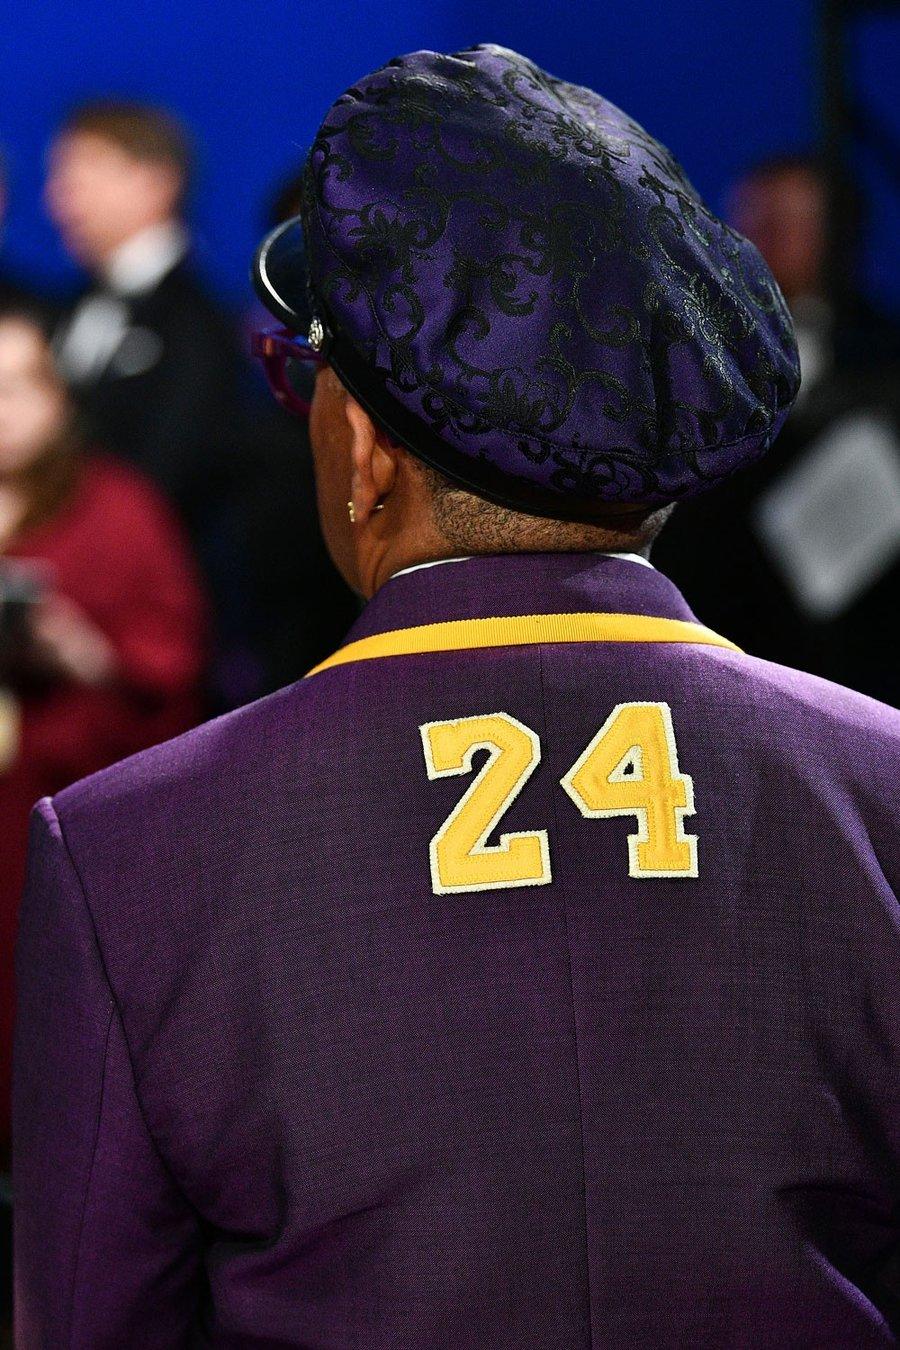 Kobe9,Nike  致敬科比!斯派克 · 李奥斯卡典礼上脚 Kobe 9!西服也超抢眼!